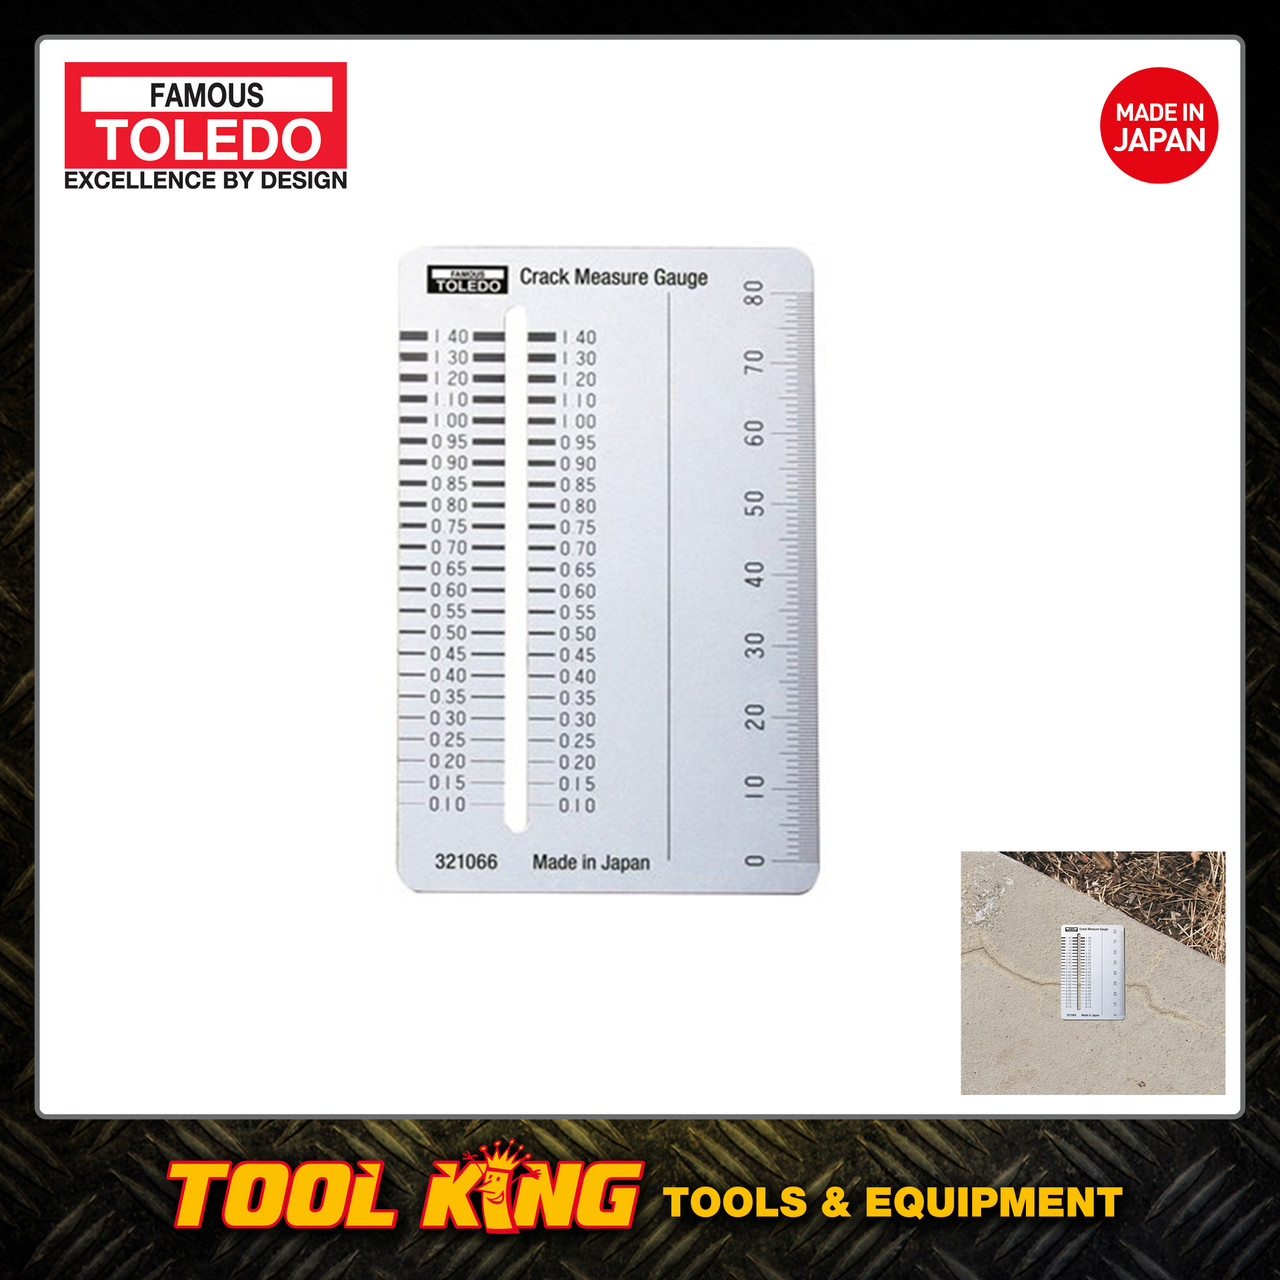 Crack measuring gauge TOLEDO professional Made in Japan